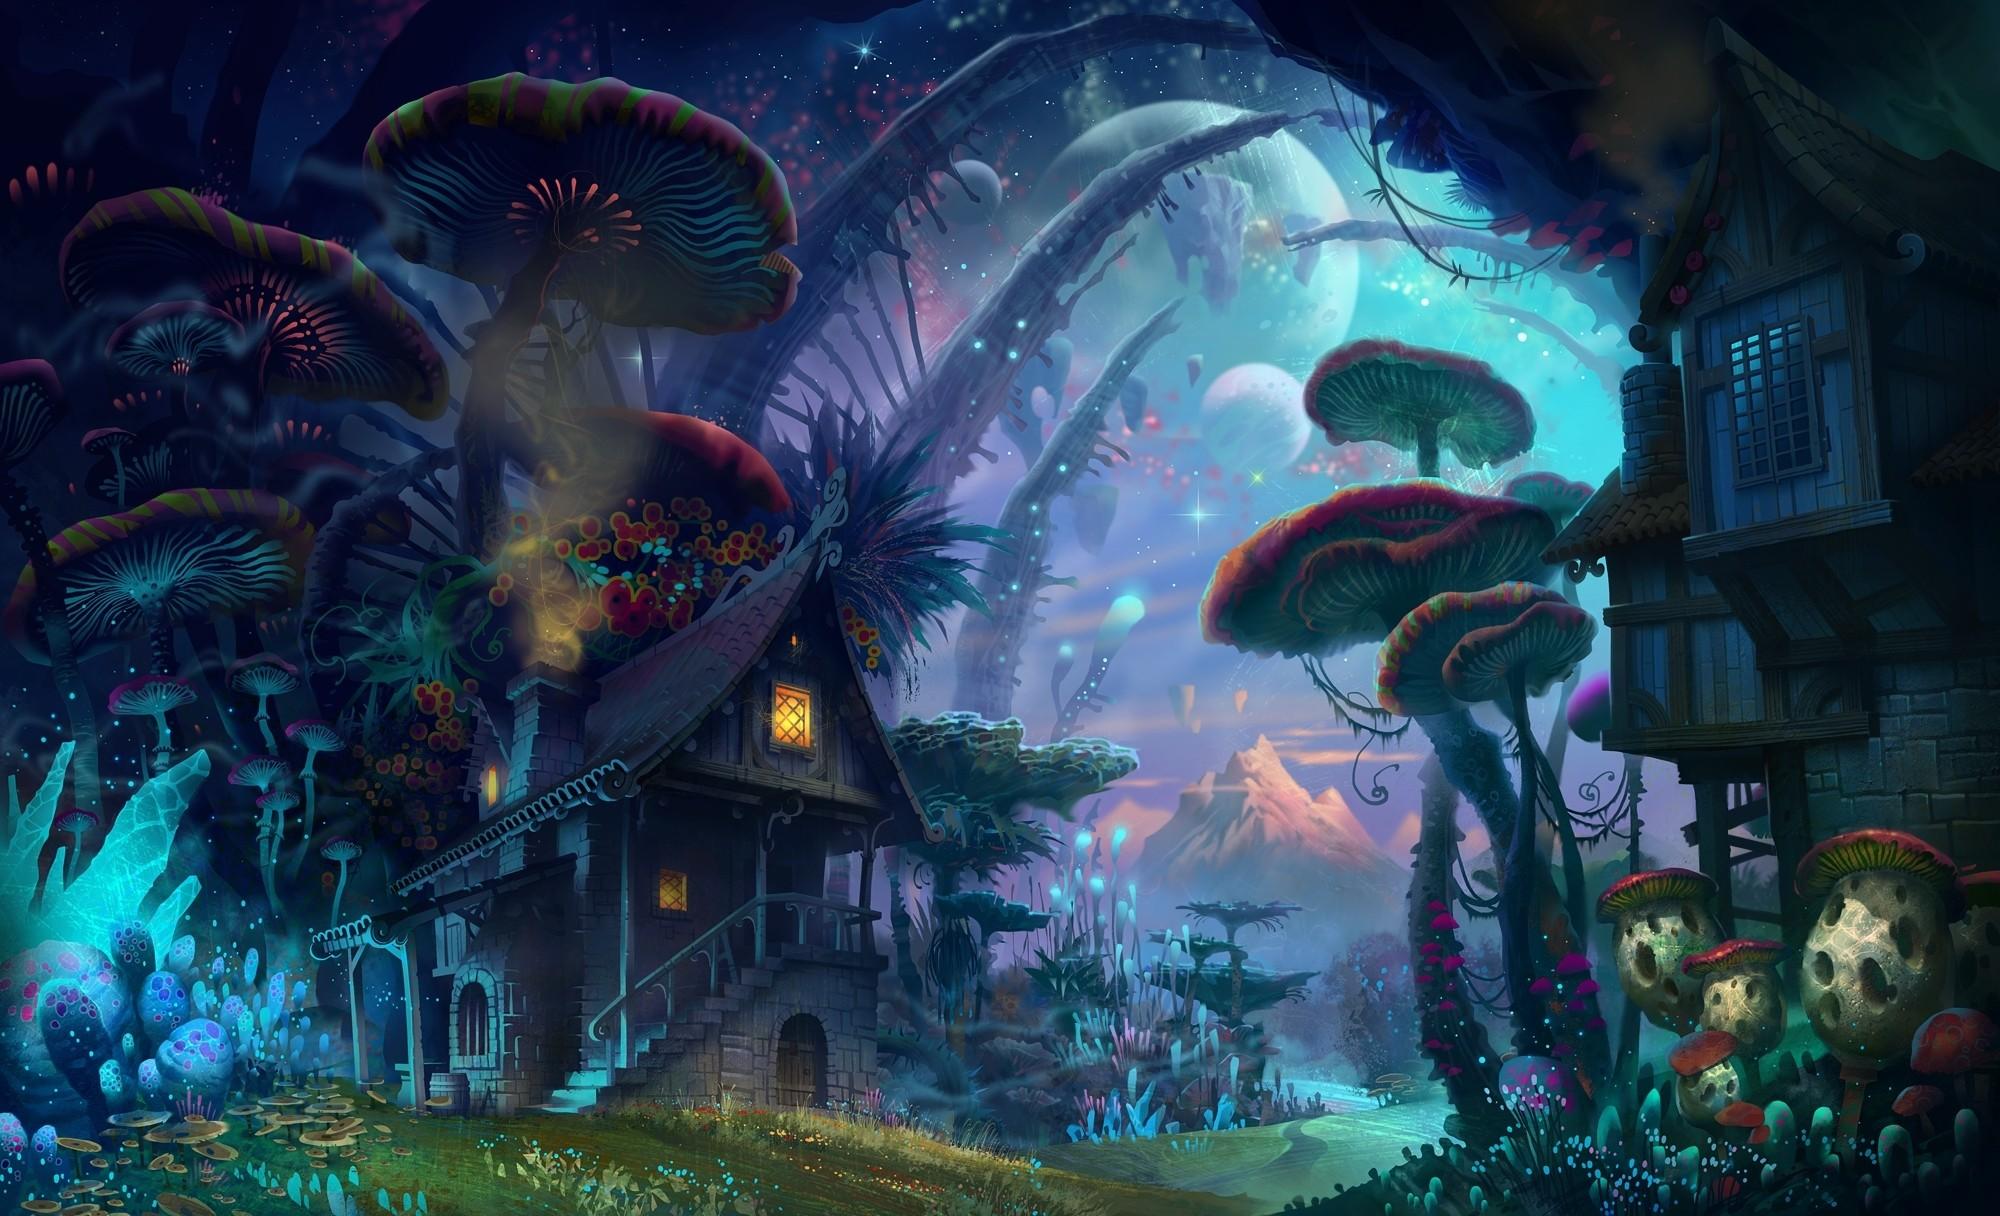 General 2000x1216 fantasy art artwork colorful mushroom plants nature house